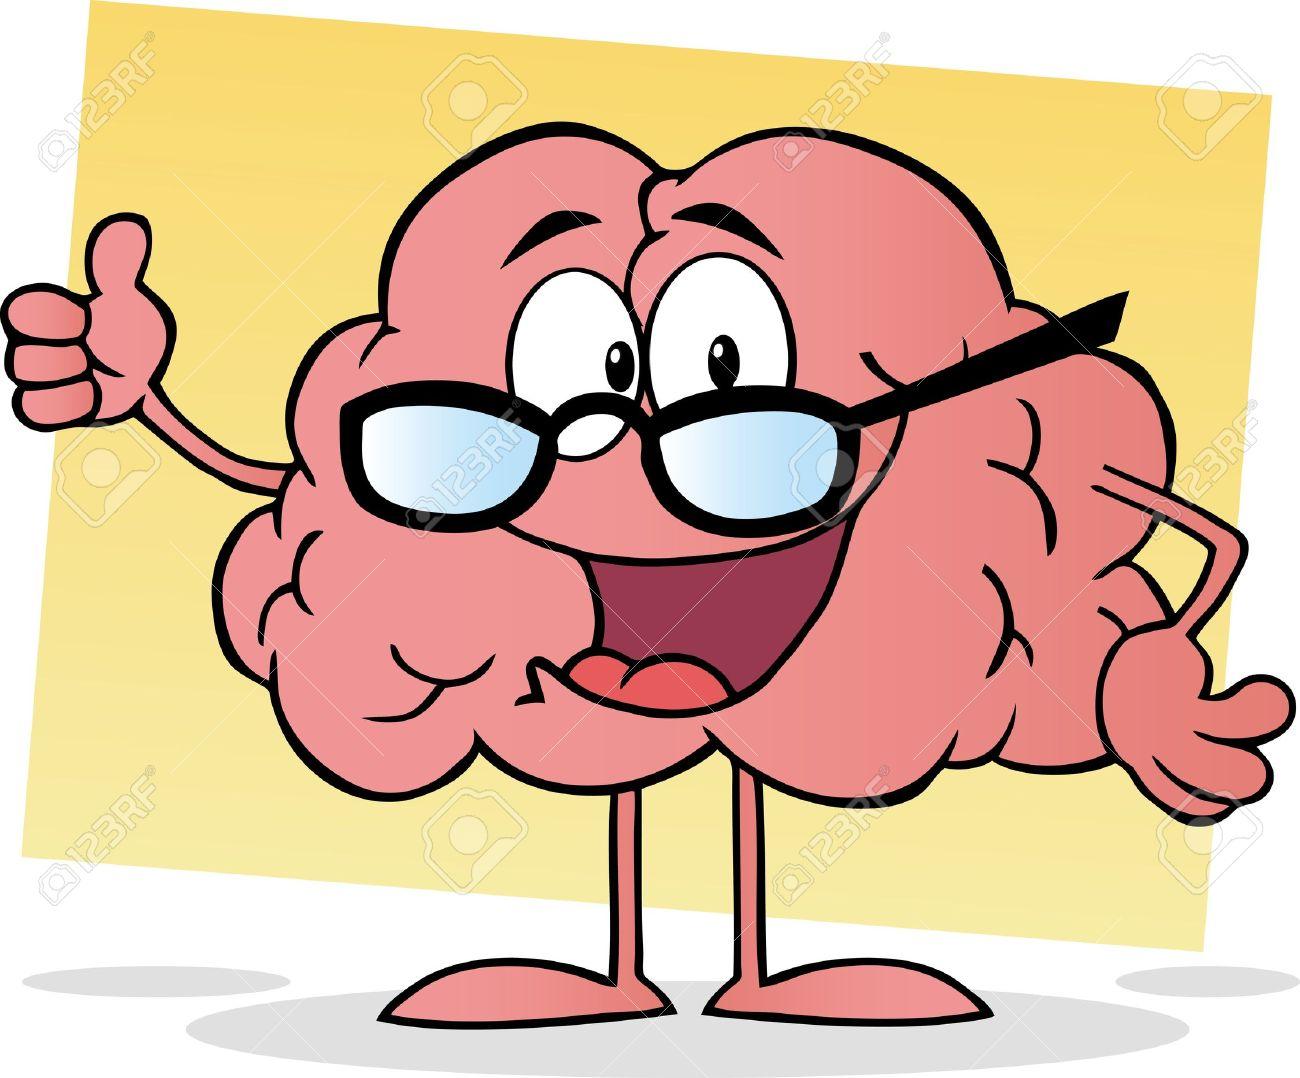 Cartoon Brain Giving The Thumbs Up Stock Vector - 10391654